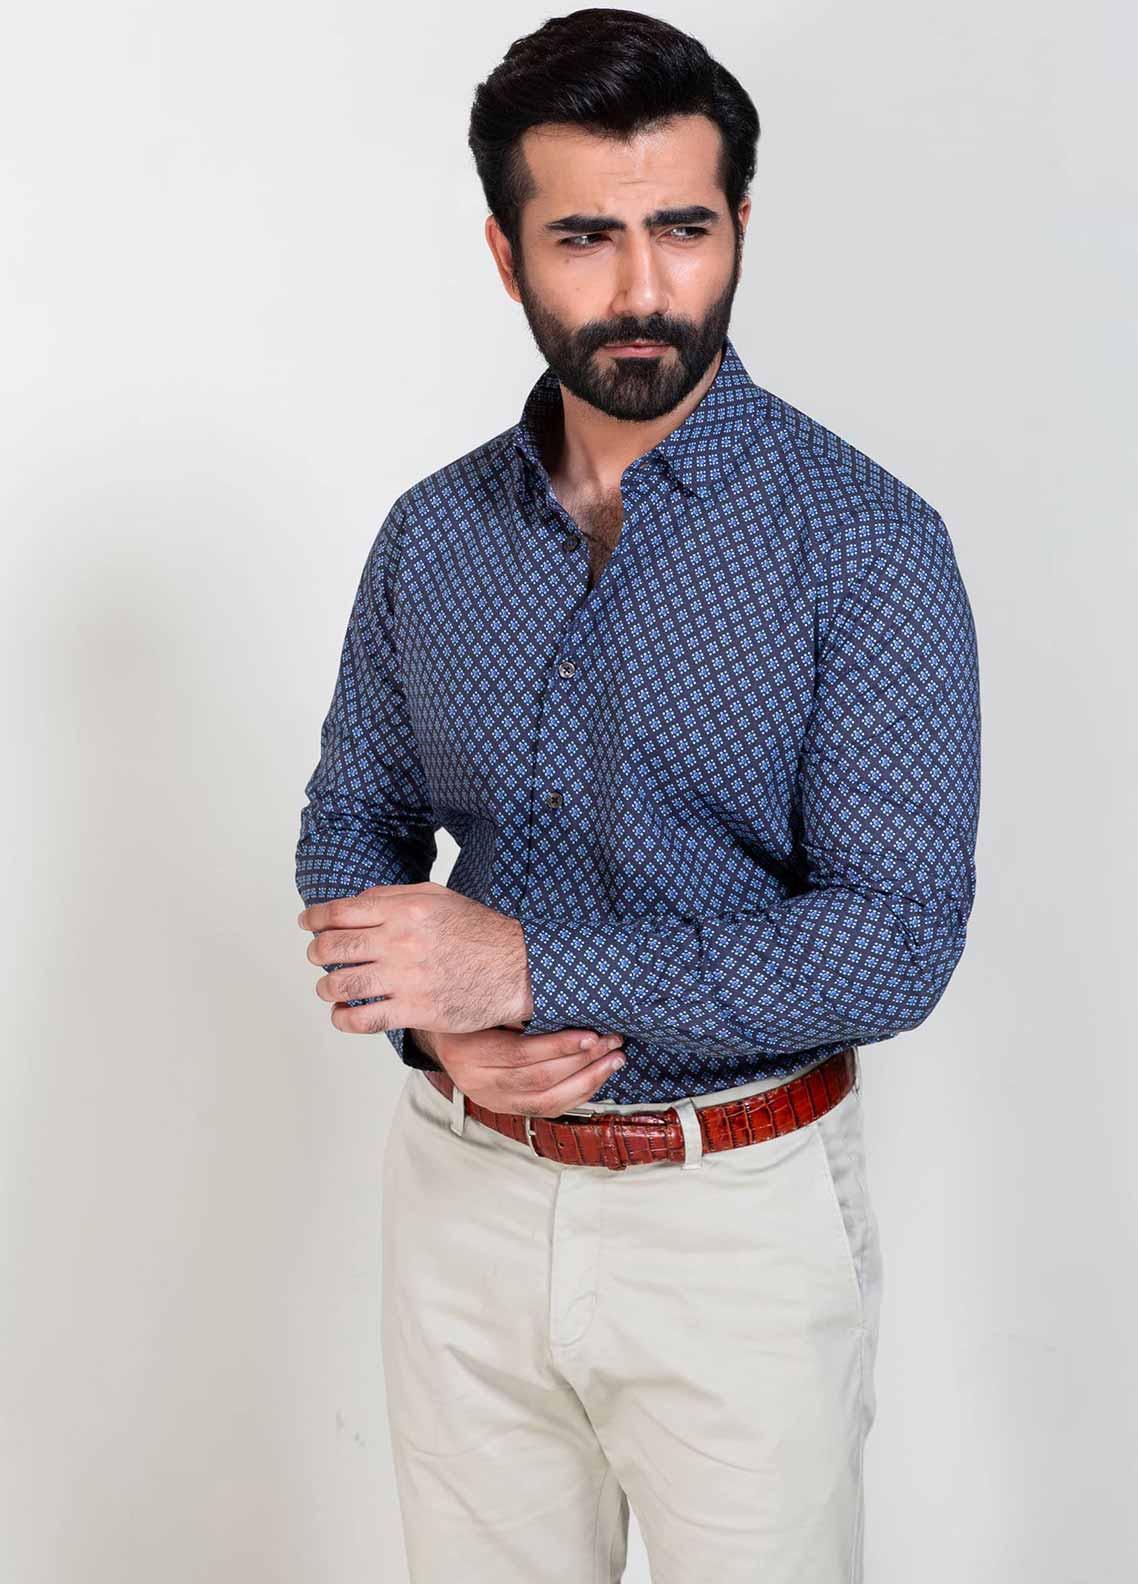 Brumano Cotton Formal Shirts for Men -  BM20SH Navy & Purple Printed Shirt